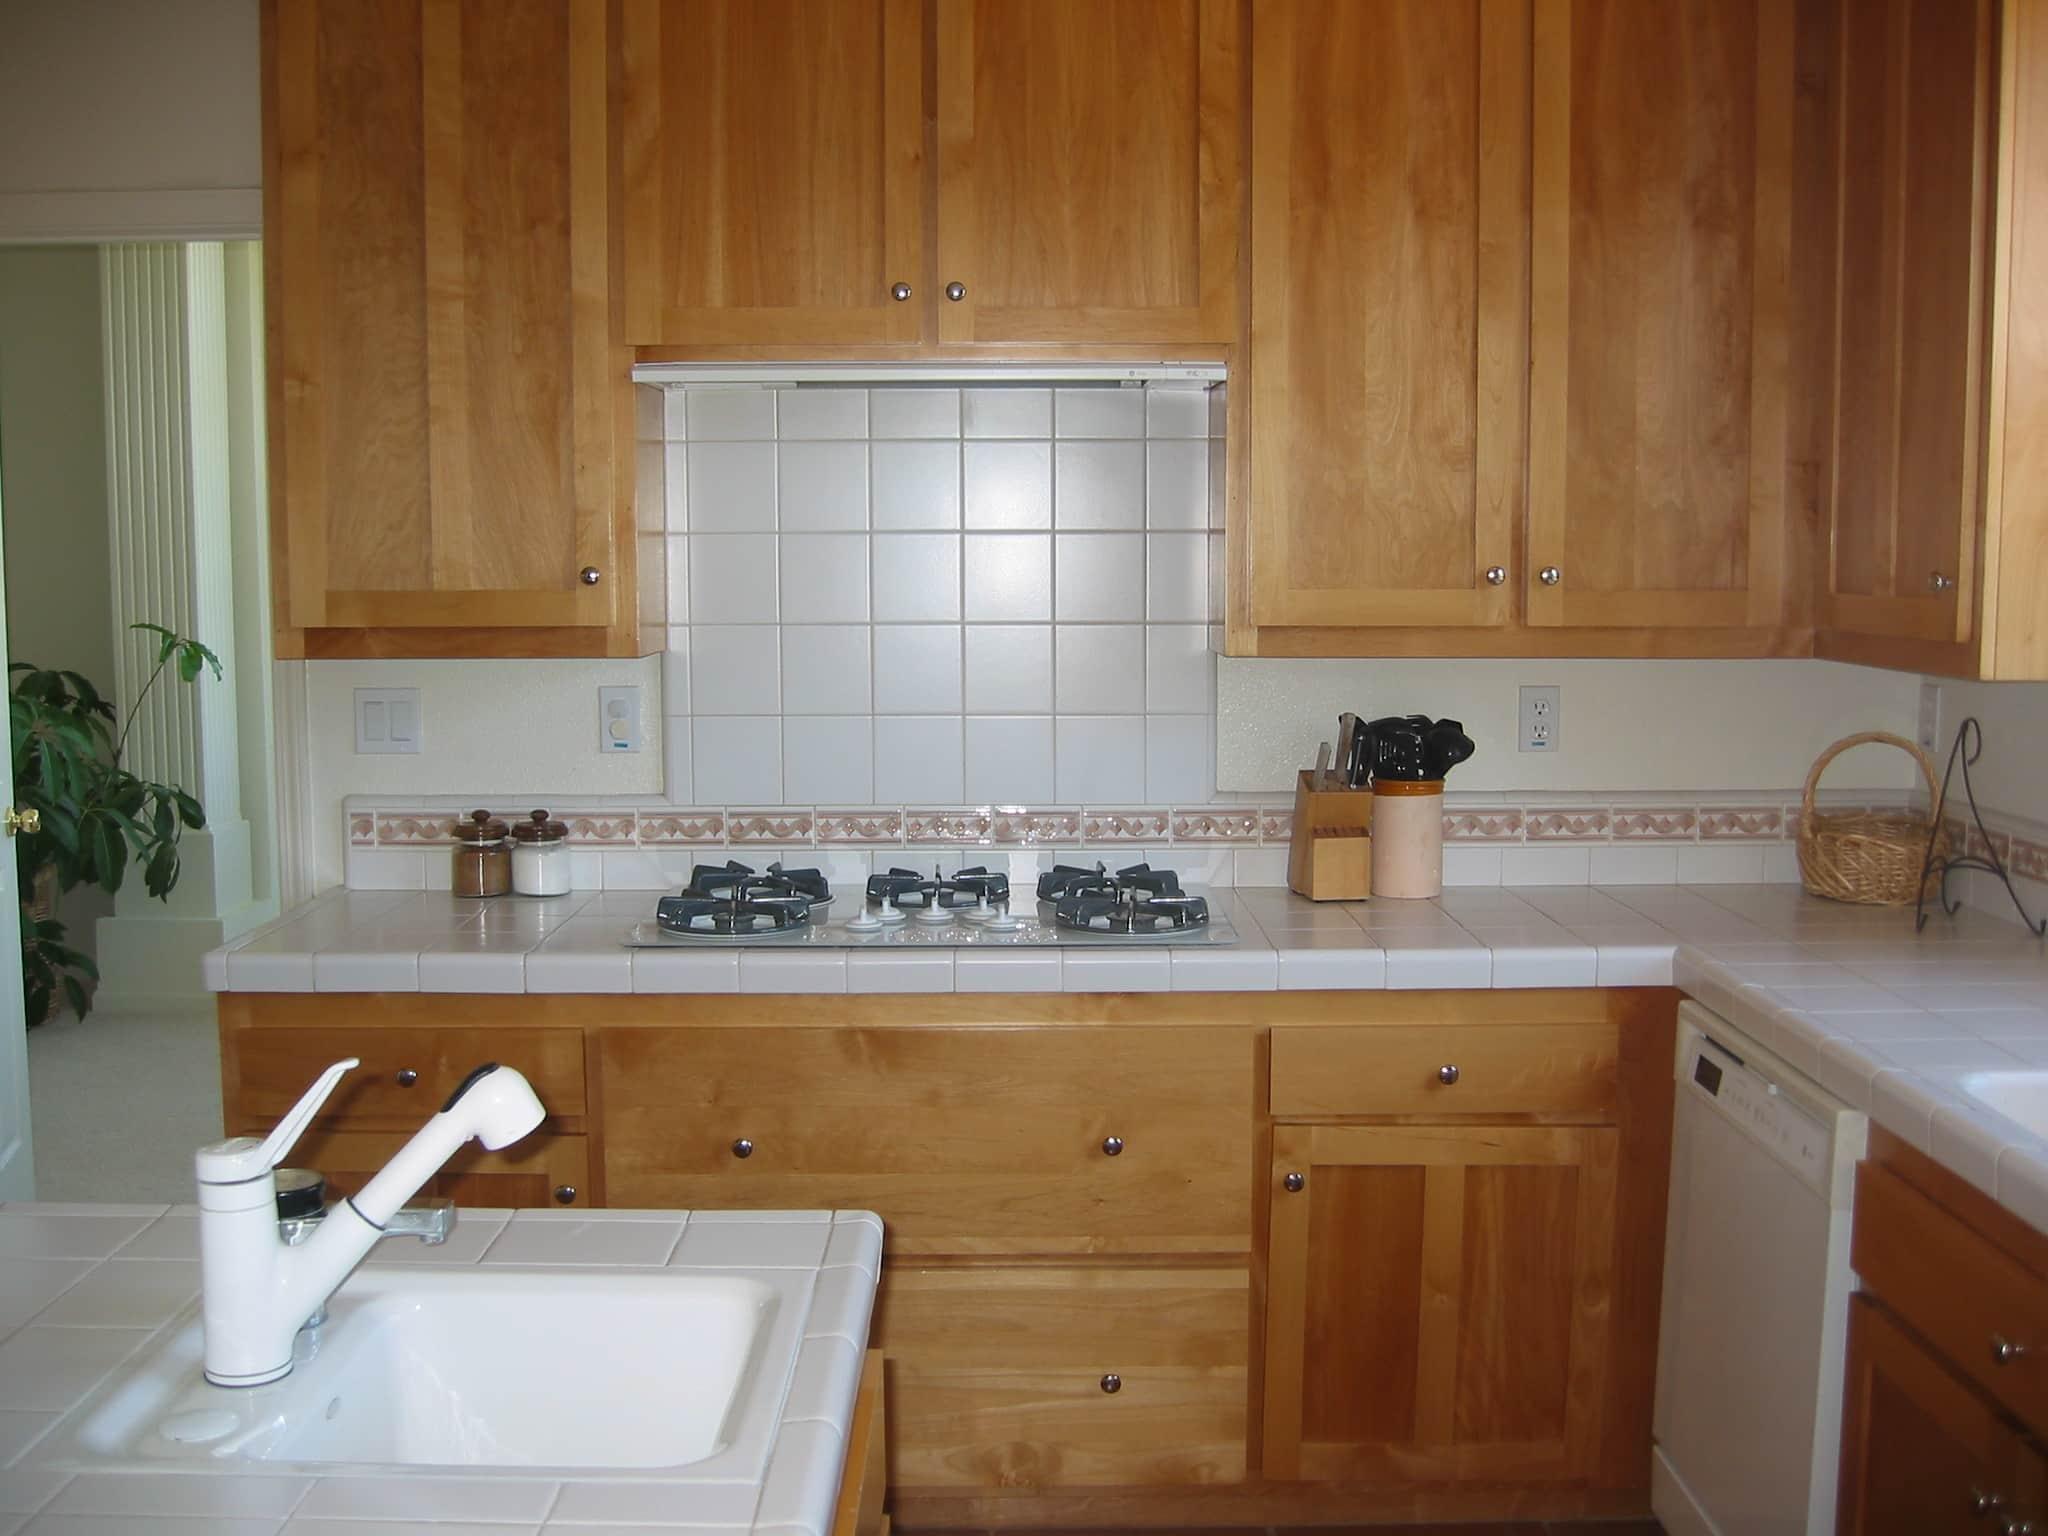 Shawna's Glamorous Custom Kitchen: gallery image 6